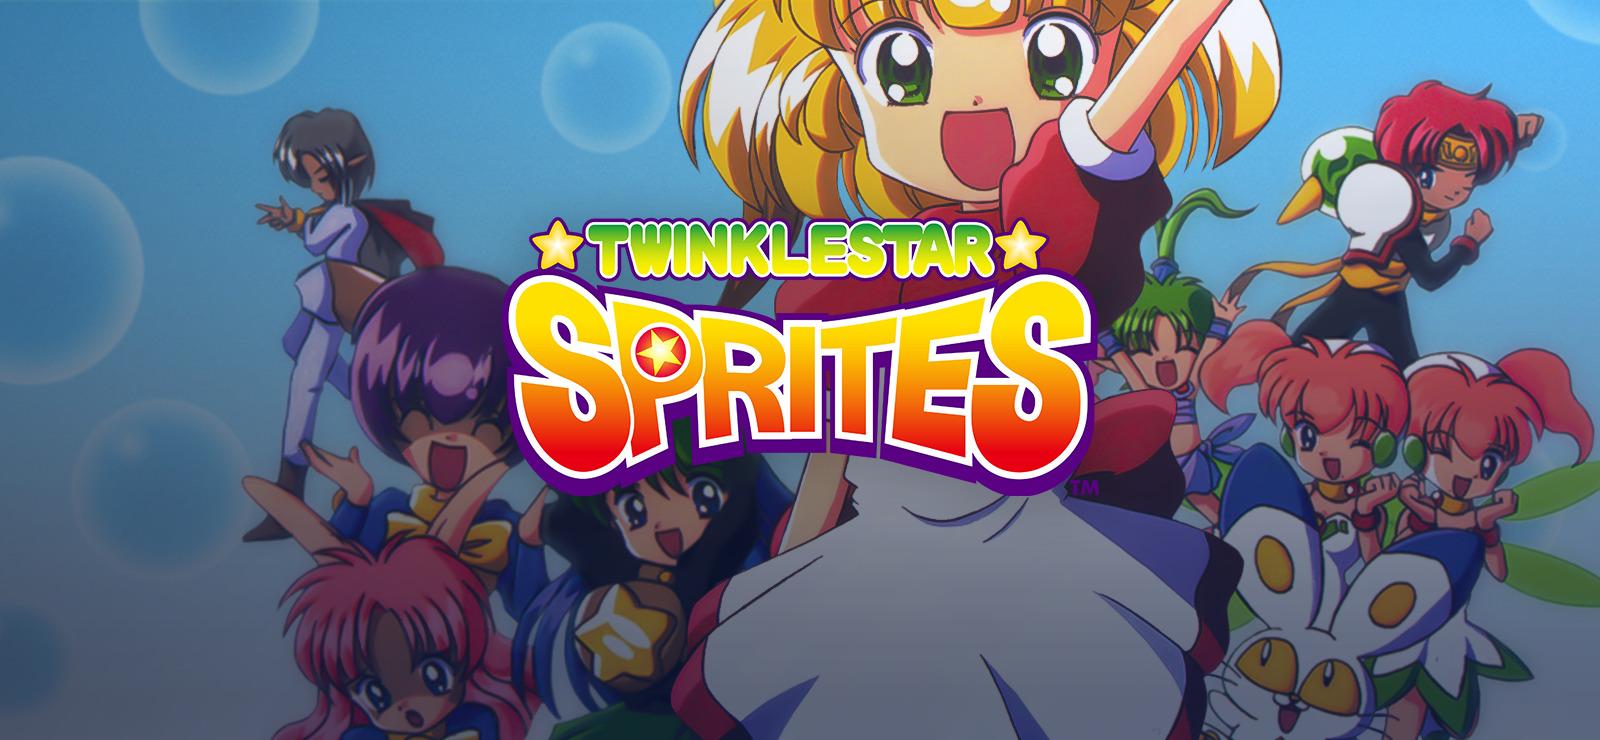 Twinkle Star Sprites SNK Corporation